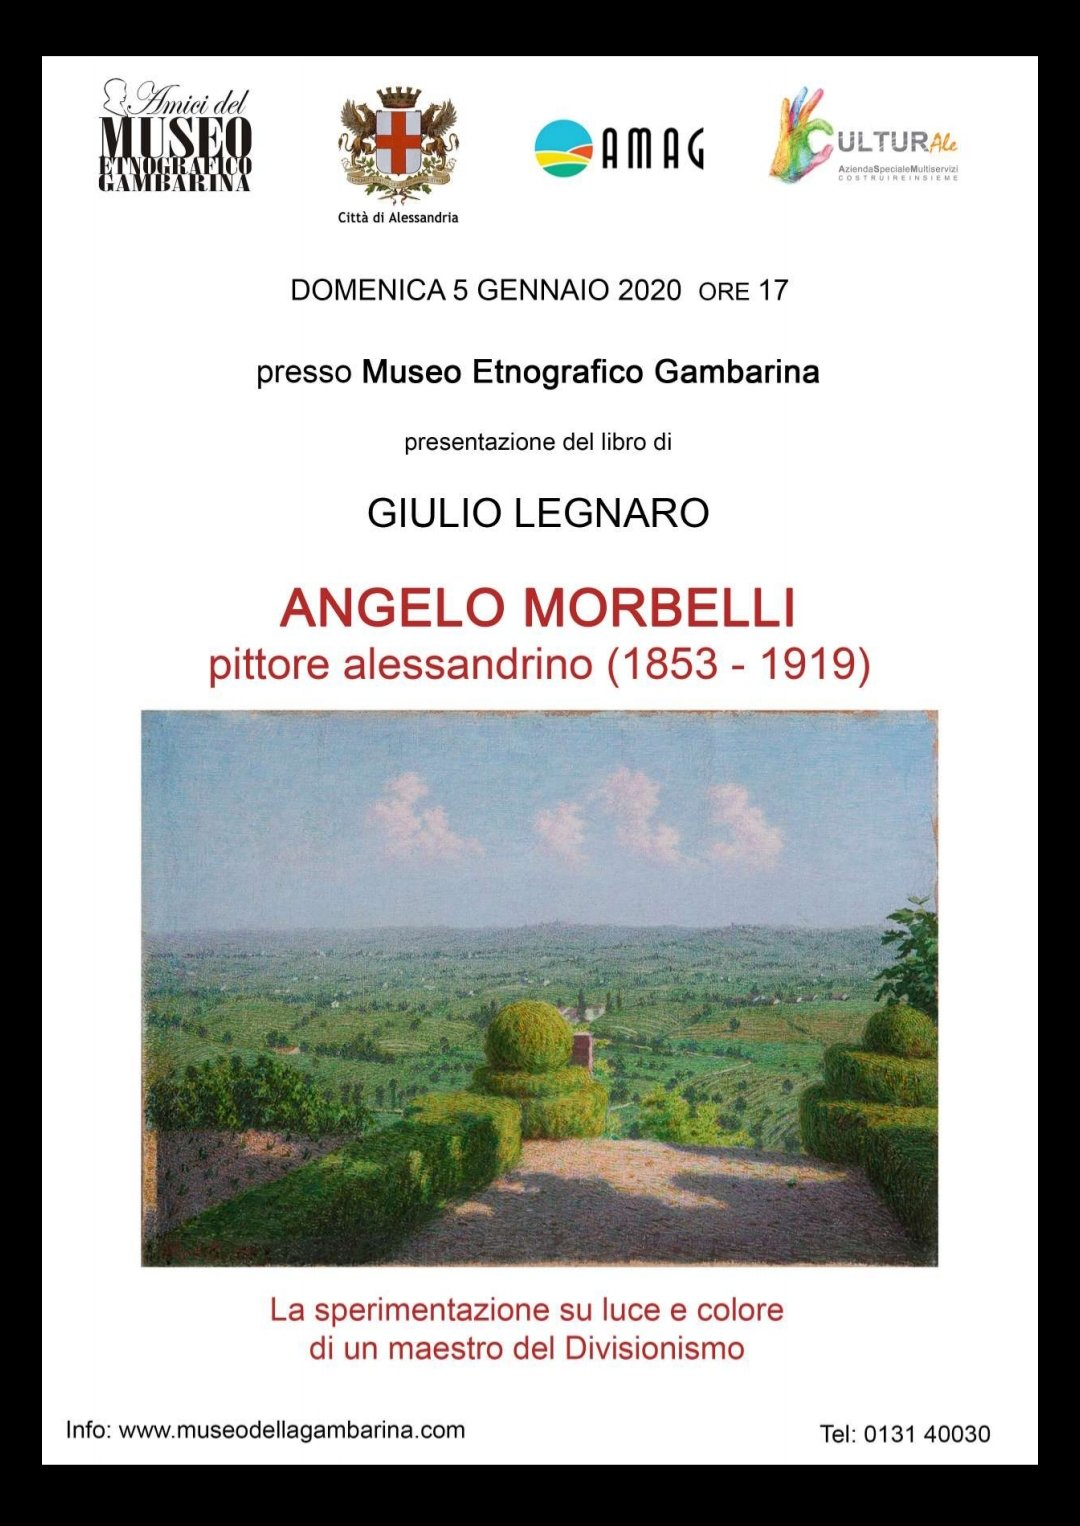 Angelo Morbelli, pittore alessandrino – Alessandria today